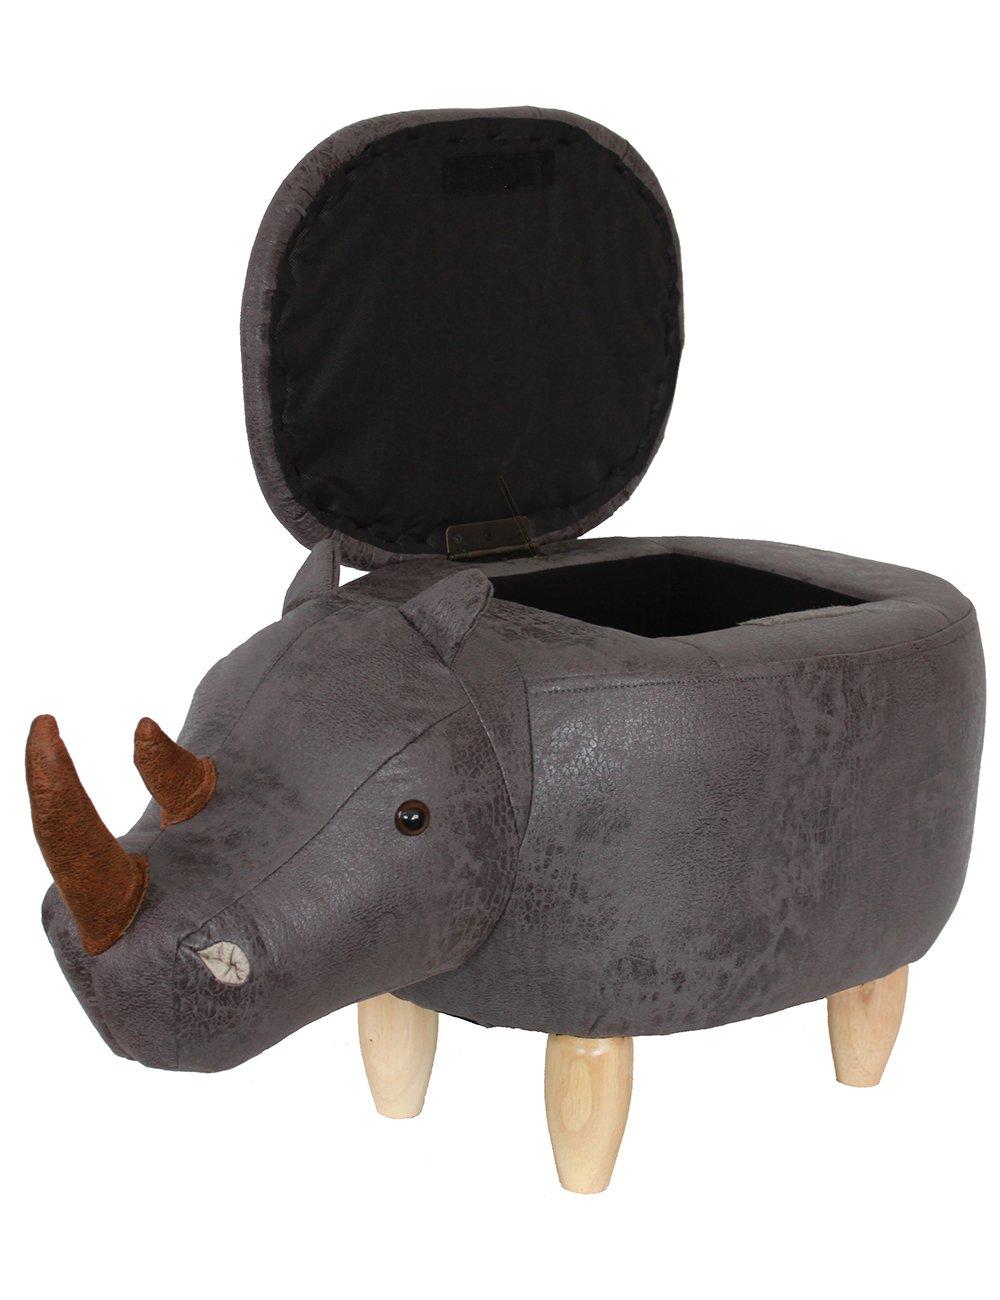 HAOSOON Animal ottoman Series Storage Ottoman Footrest Stool with Vivid Adorable Animal-Like Features(Rhinoceros) (grey) by HAOSOON (Image #5)